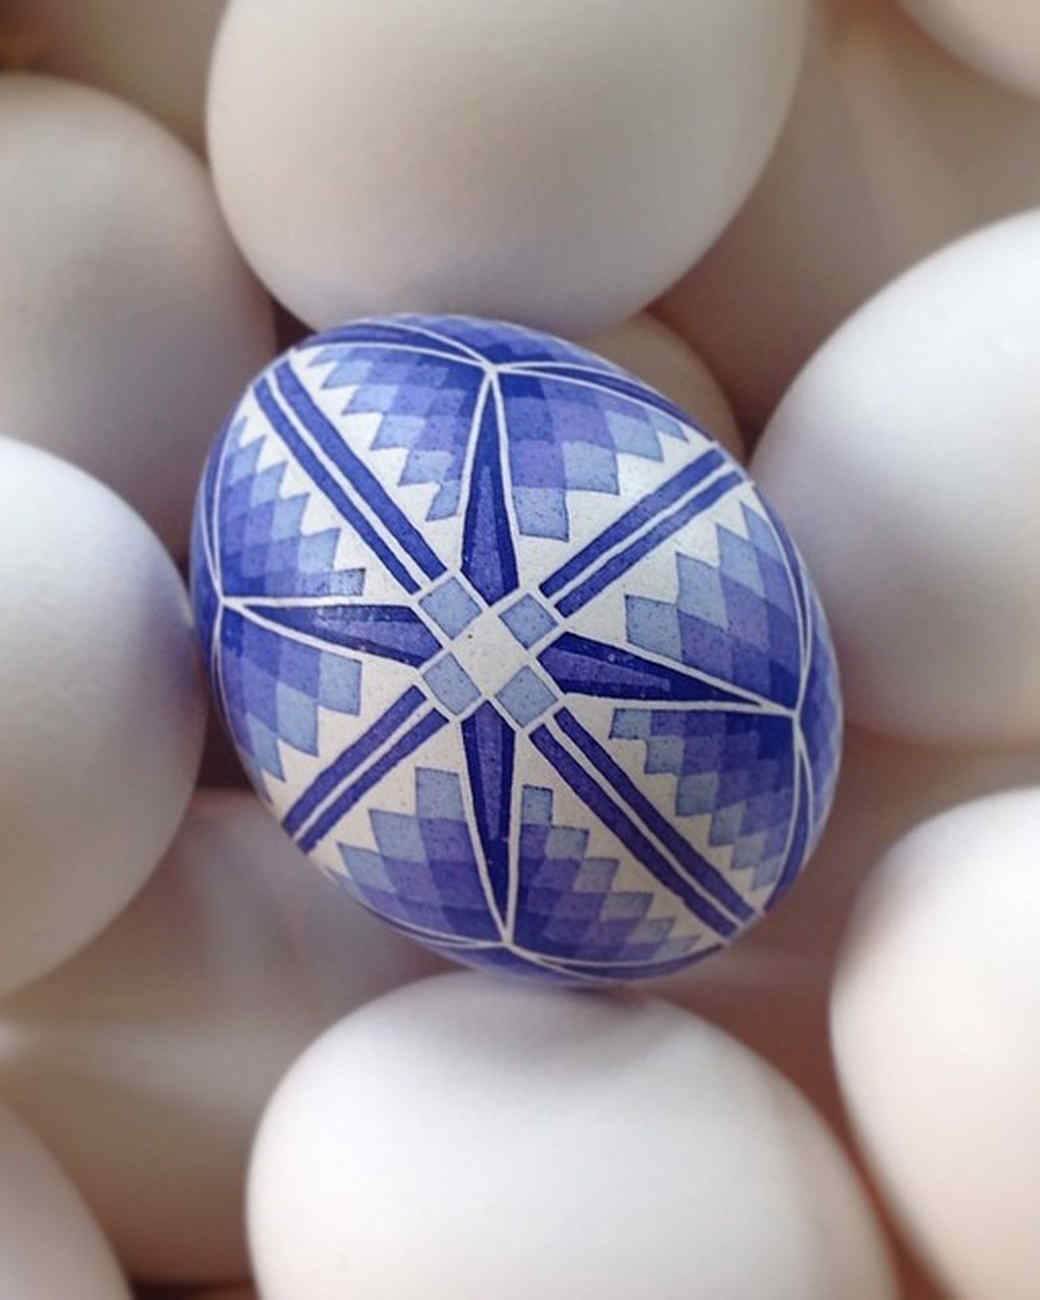 marthas-egg-hunt-miishka_pozniak-0414.jpg